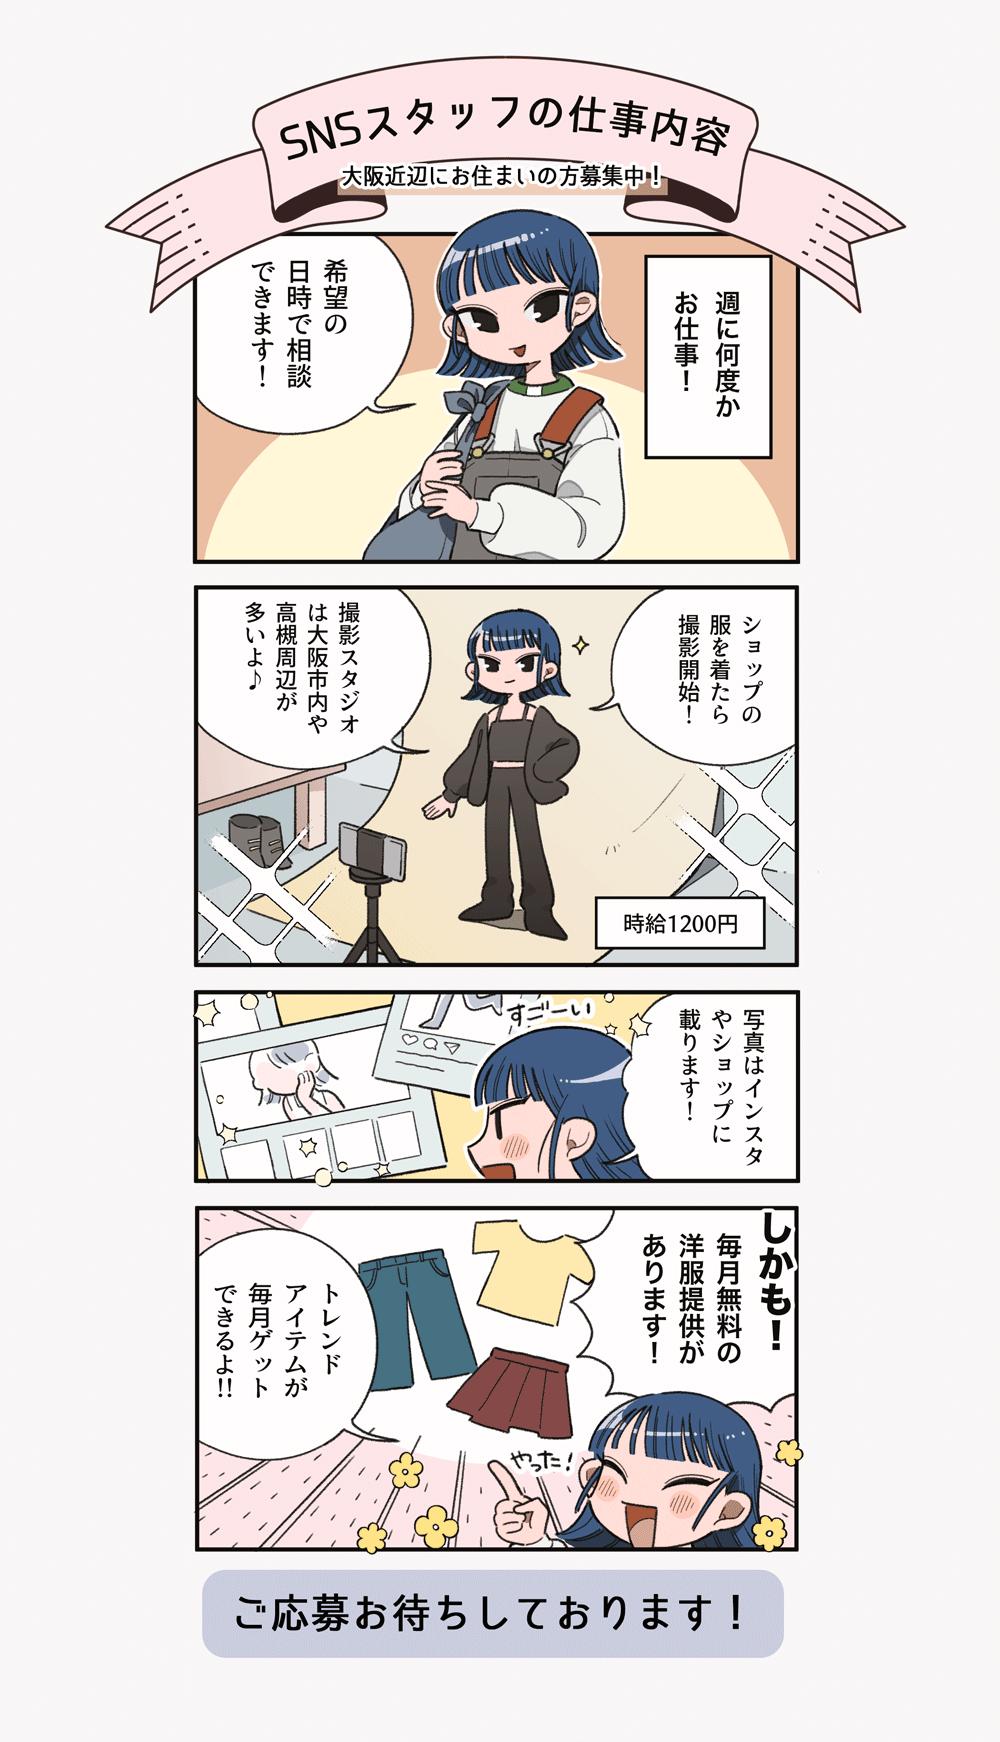 SNSスタッフ募集!【時給1200円】